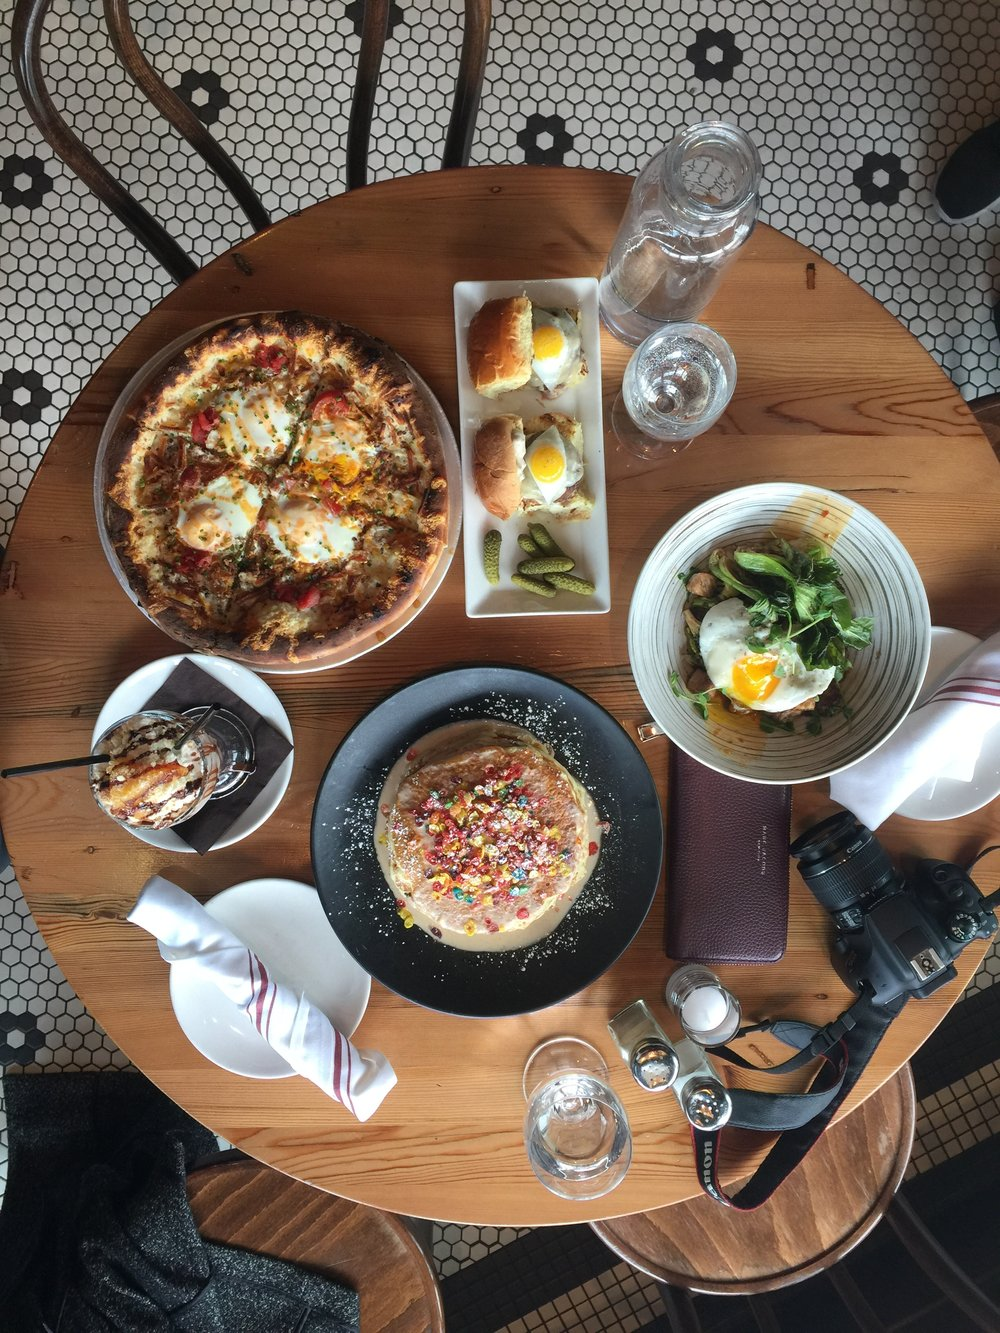 Lincoln-Tavern-Southie-Best-Brunch-Fruity-Pebbles-Pancakes